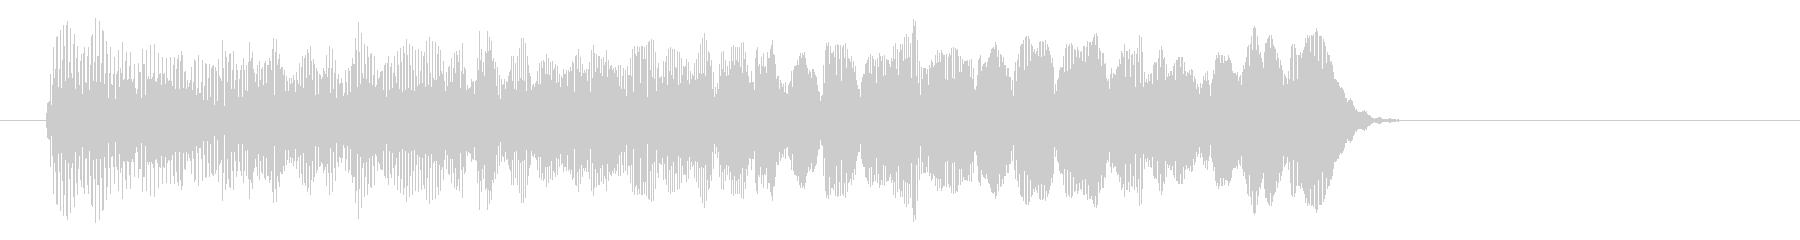 8bitパワーup-01-4_dryの未再生の波形